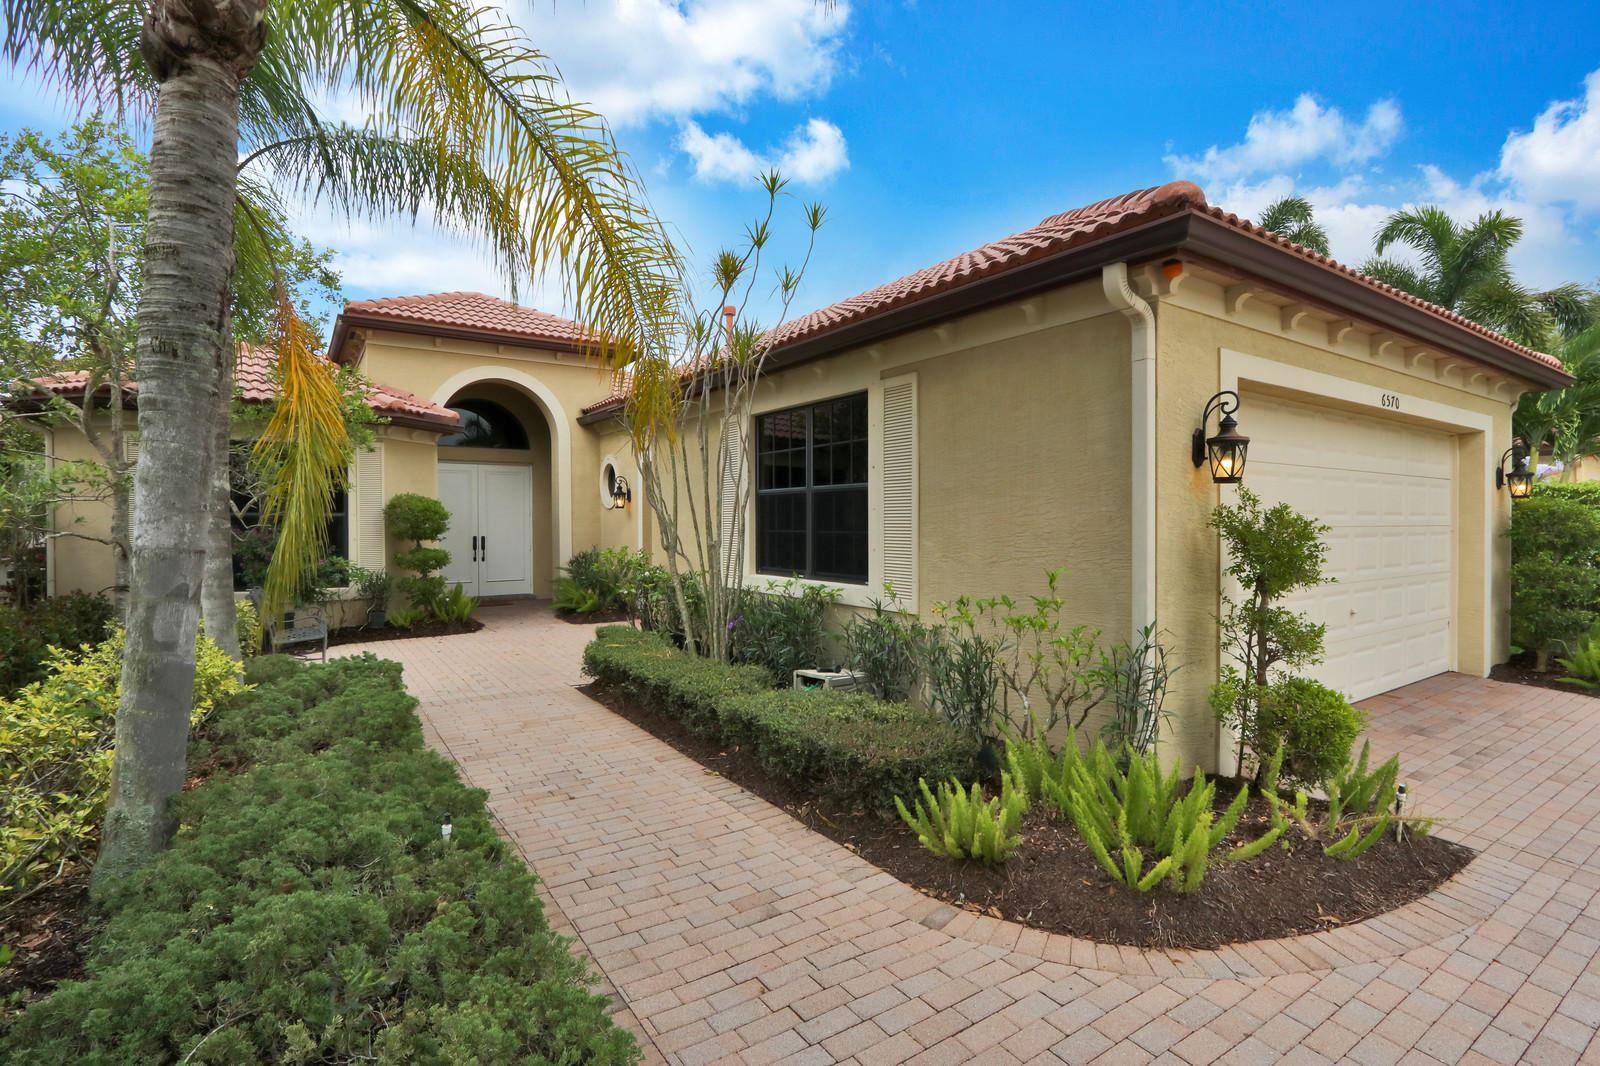 6570 Sparrow Hawk Drive, West Palm Beach, FL 33412 - #: RX-10624793